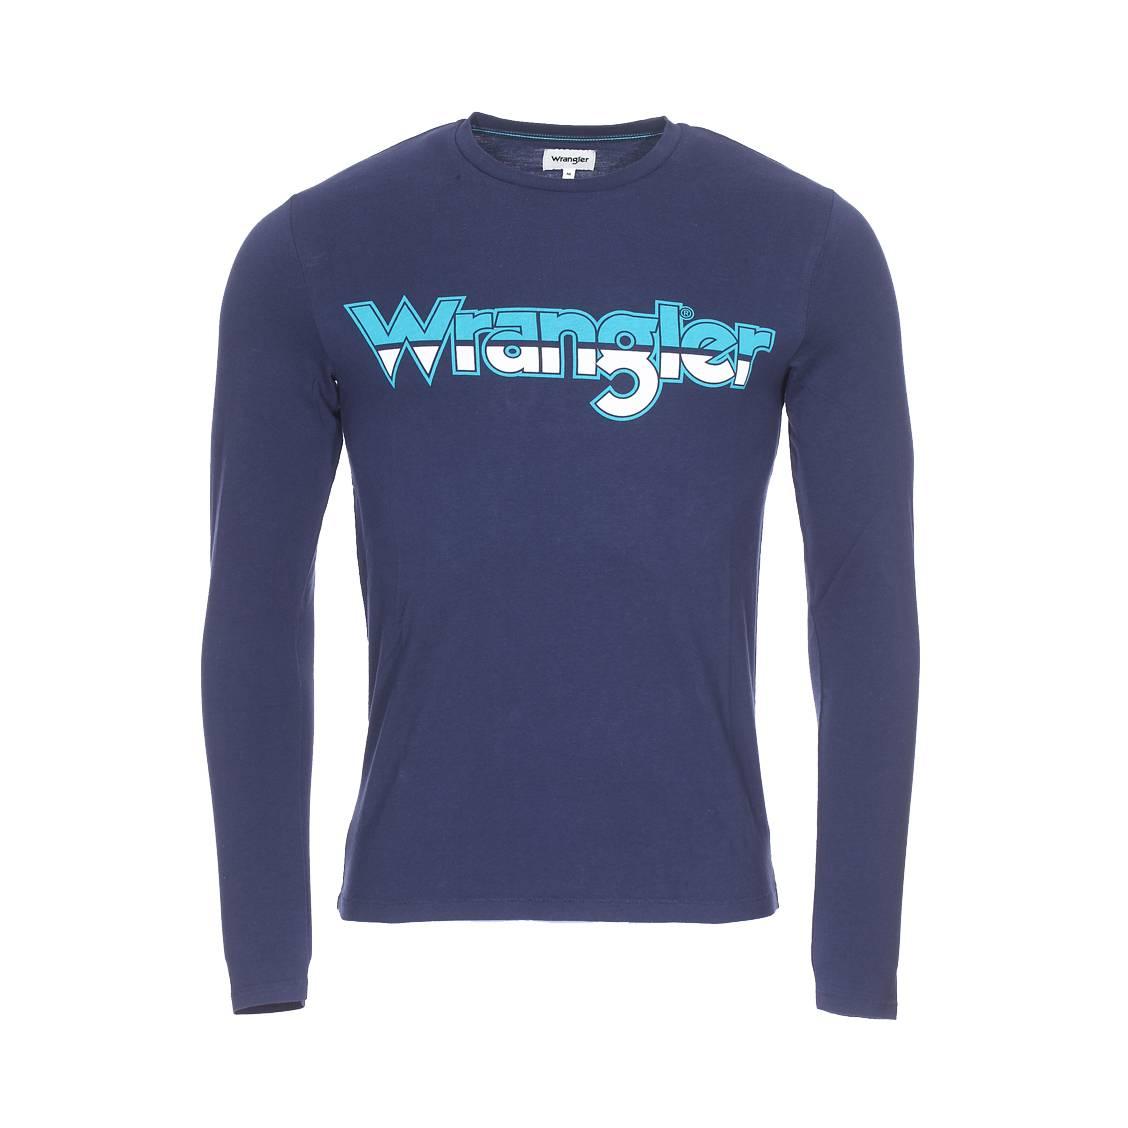 Tee-shirt col rond manches longues  logo en coton bleu marine floqué